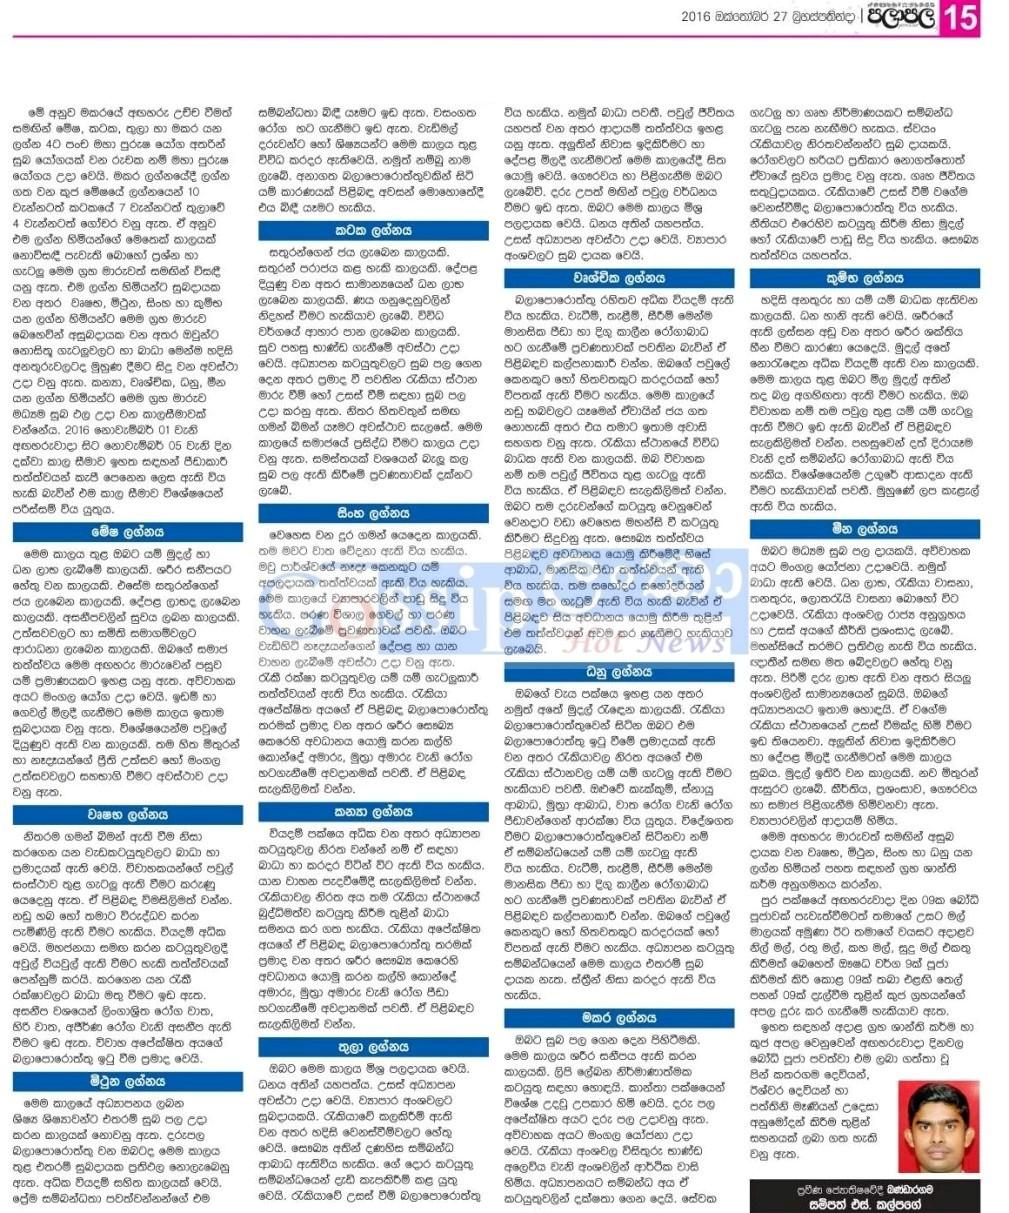 Kuja Maruwa 2016 | Obe Lagnayata | Sinhala Horoscope Predictions